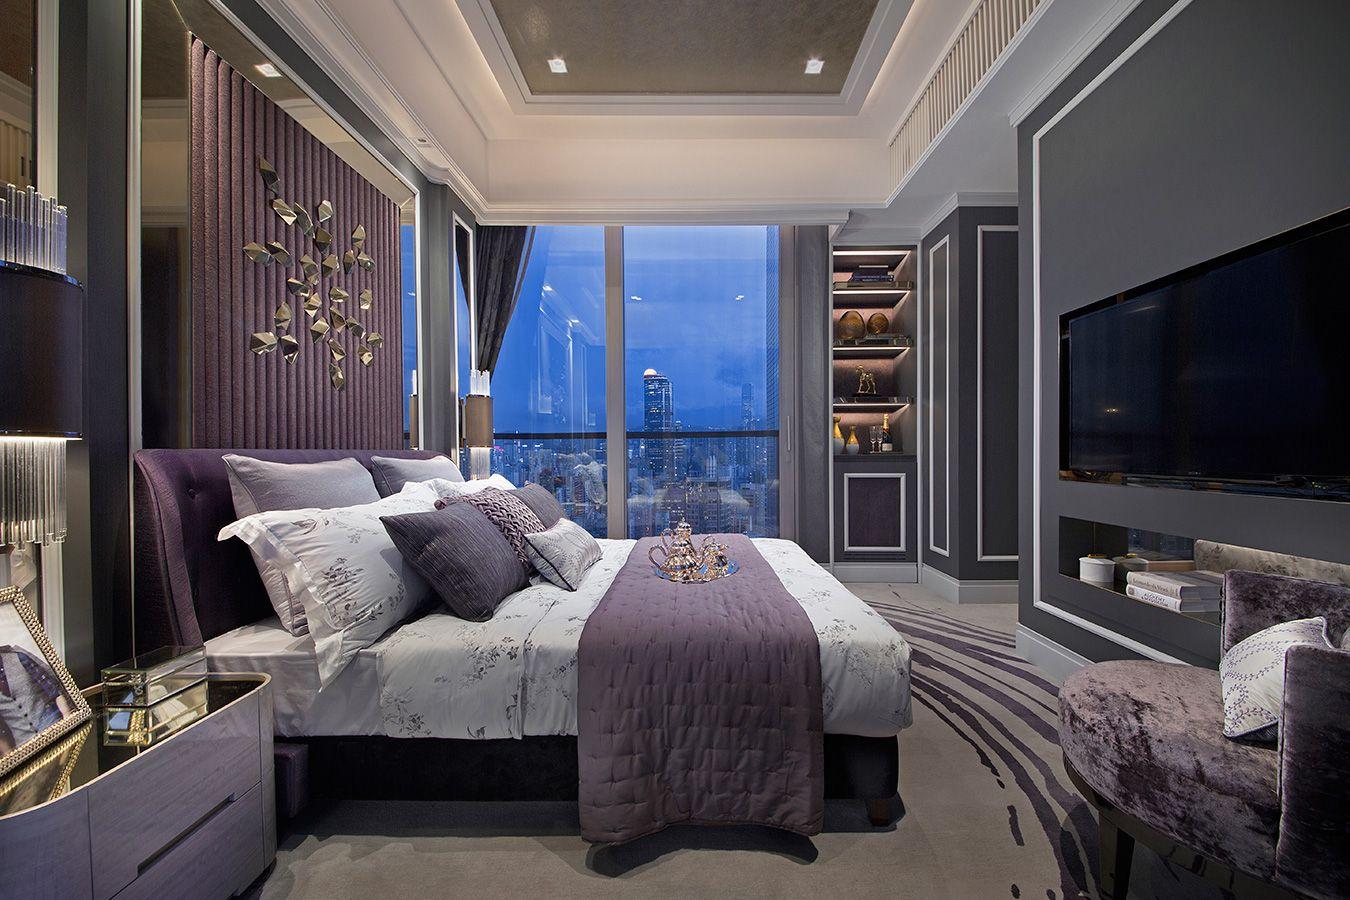 Established by the world renowned interior designer Mr